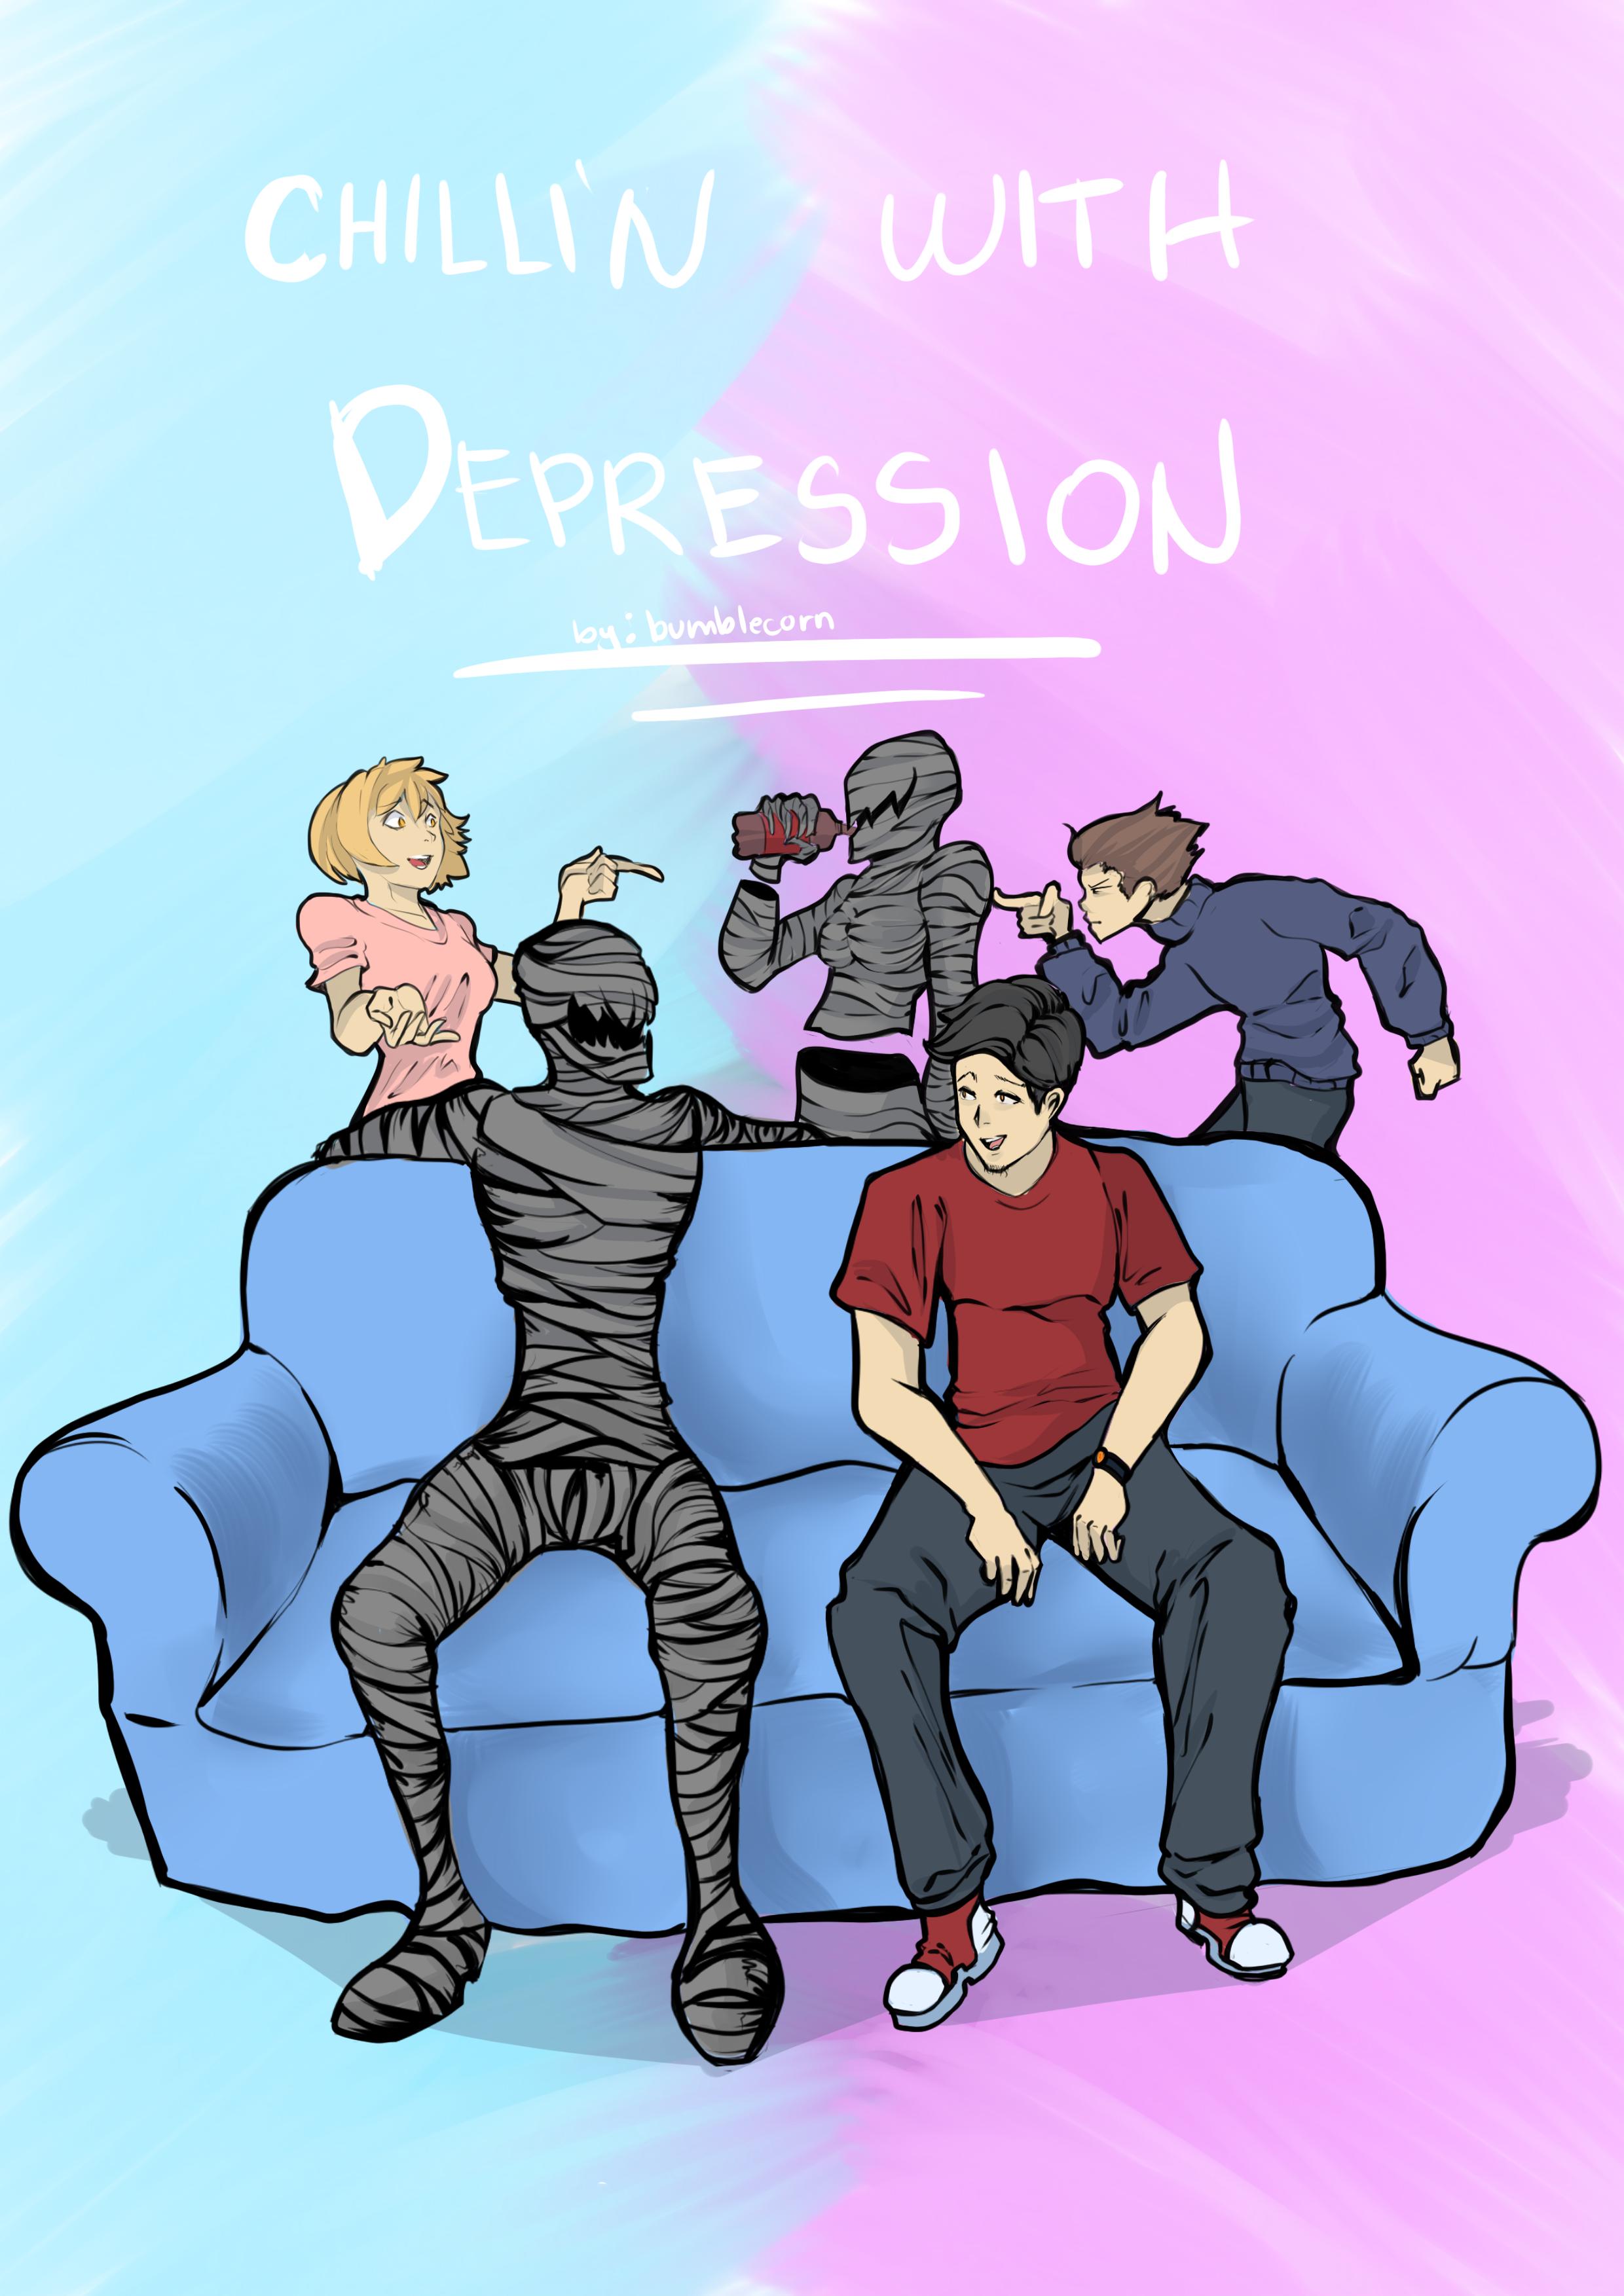 Chillin with Depression